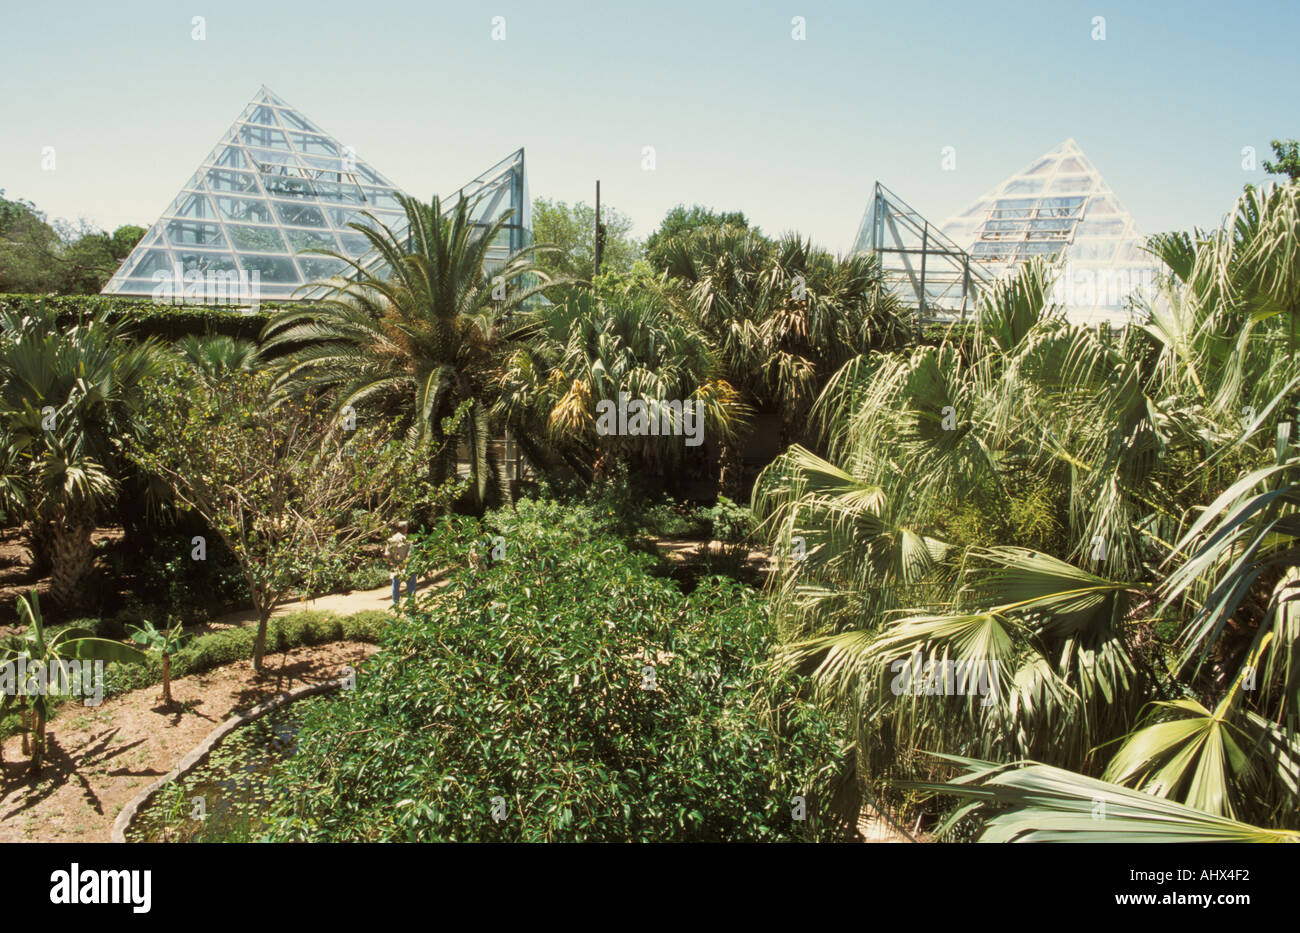 San Antonio Texas USA Botanical Garden Pyramid Shaped Conservatory